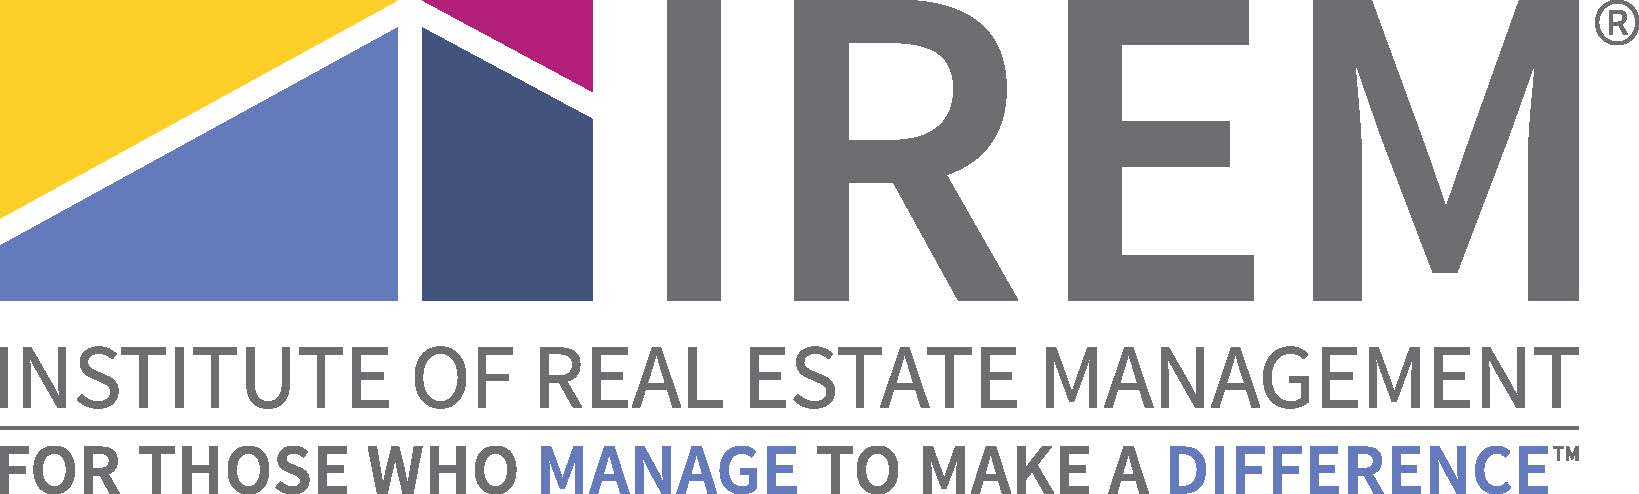 IREM Tagline Logo - CMYK